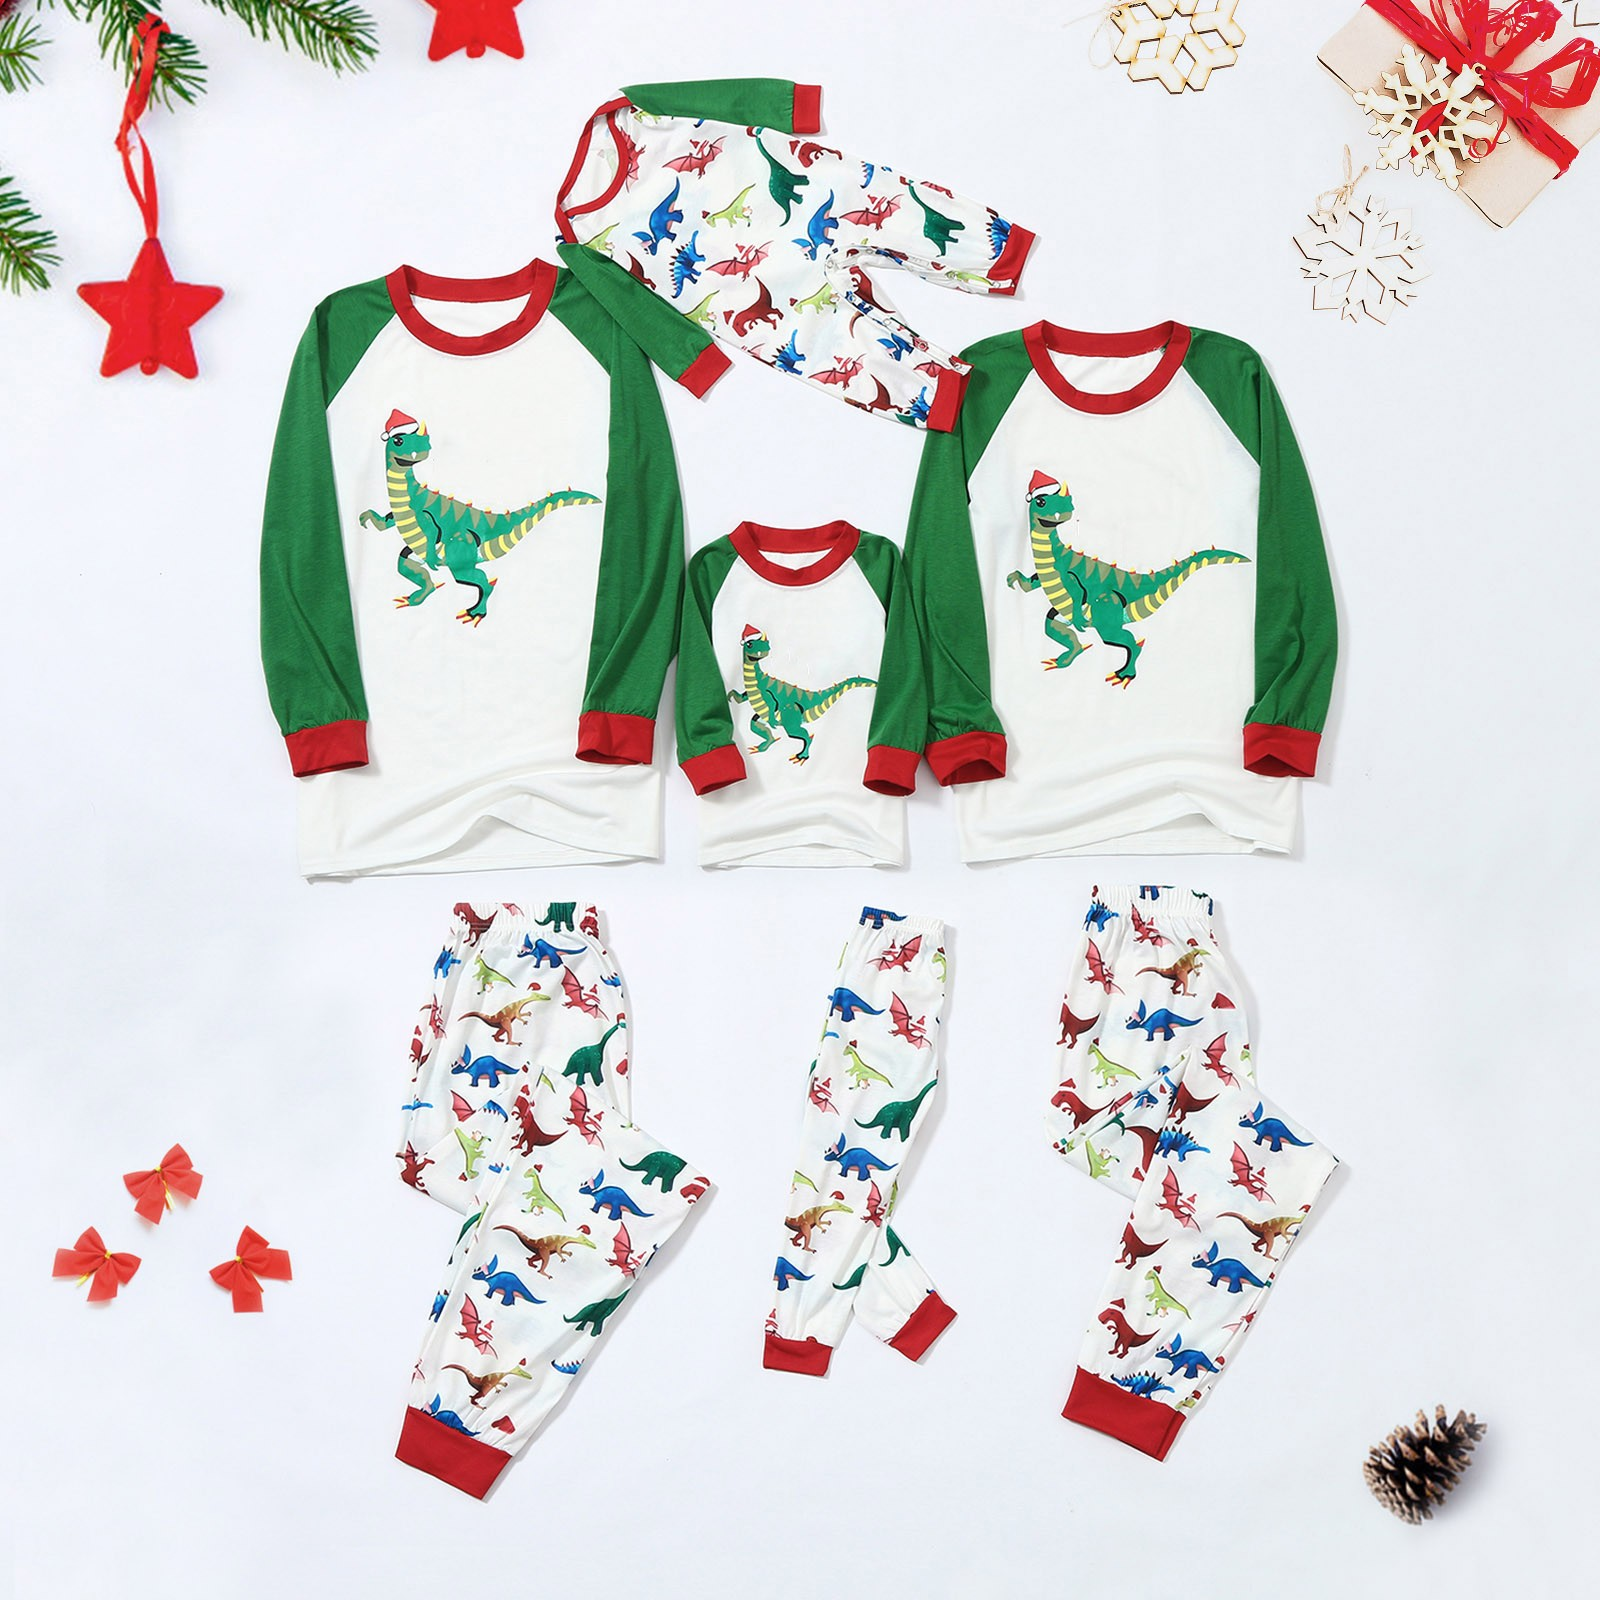 Pijama navideño con estampado de dinosaurio, Top, blusa + pantalón, para dormir,...